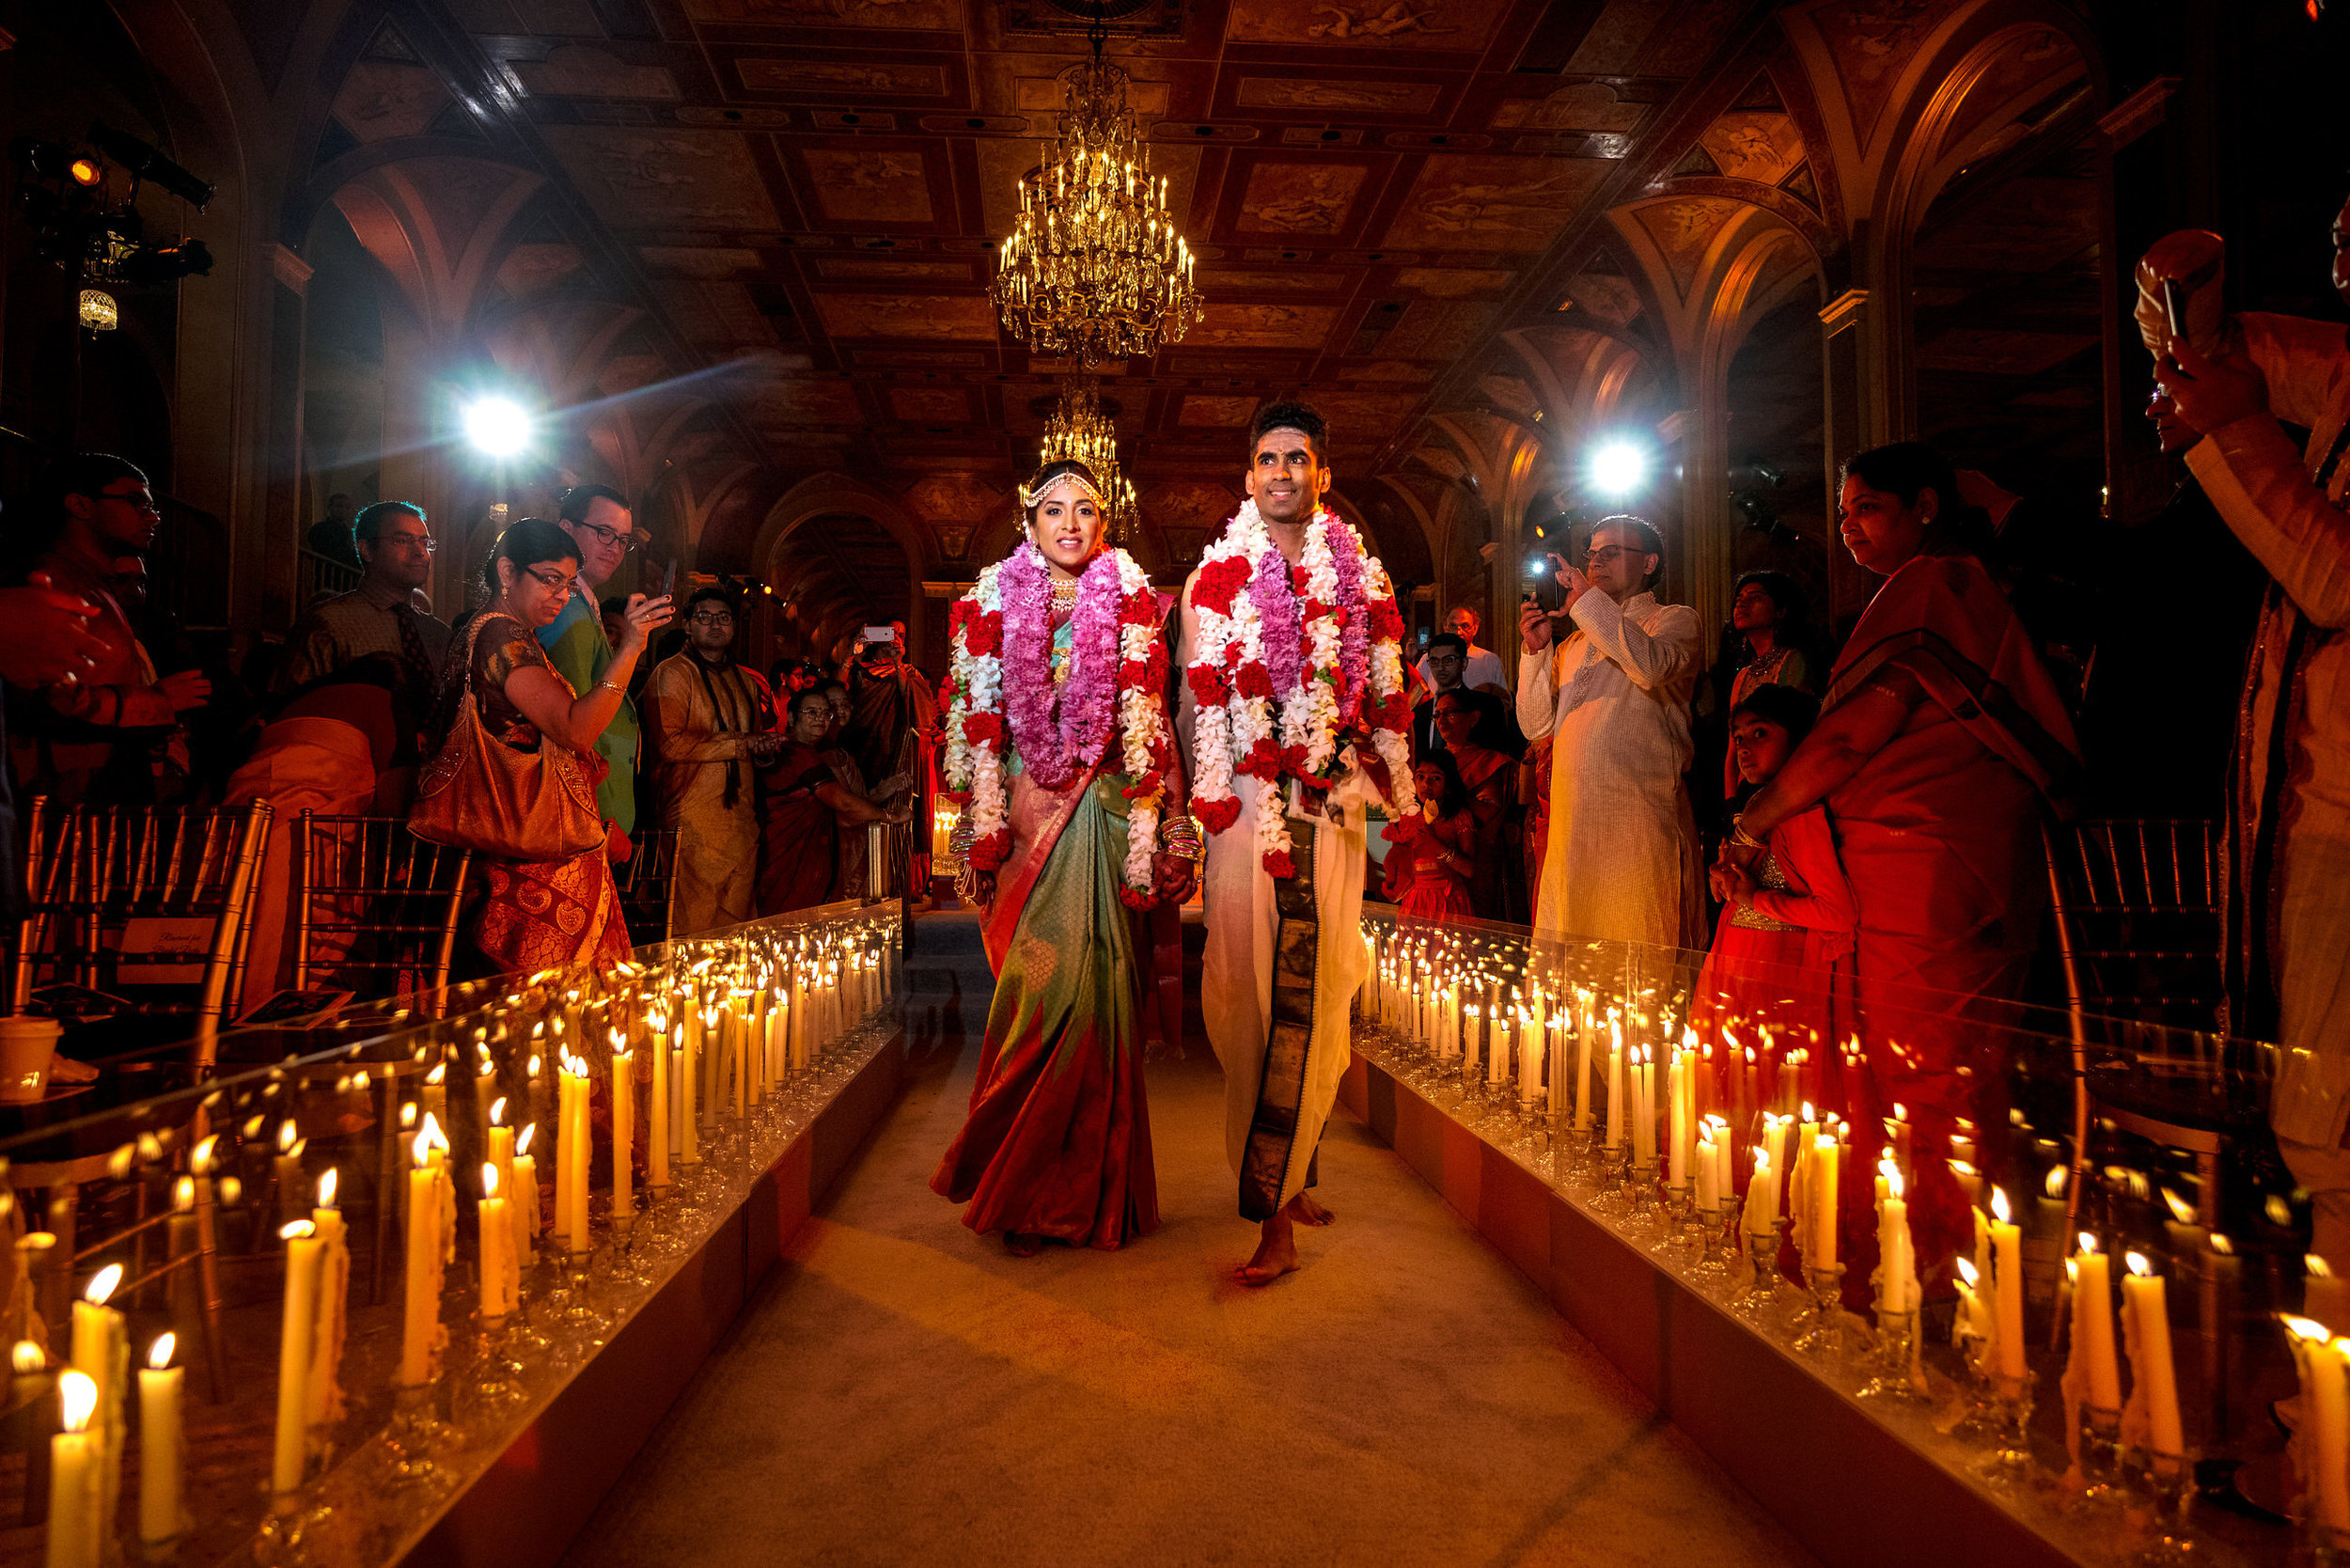 INDIAN WEDDING BRIDE AND GROOM WALKING DOWN CEREMONY AISLE.JPG